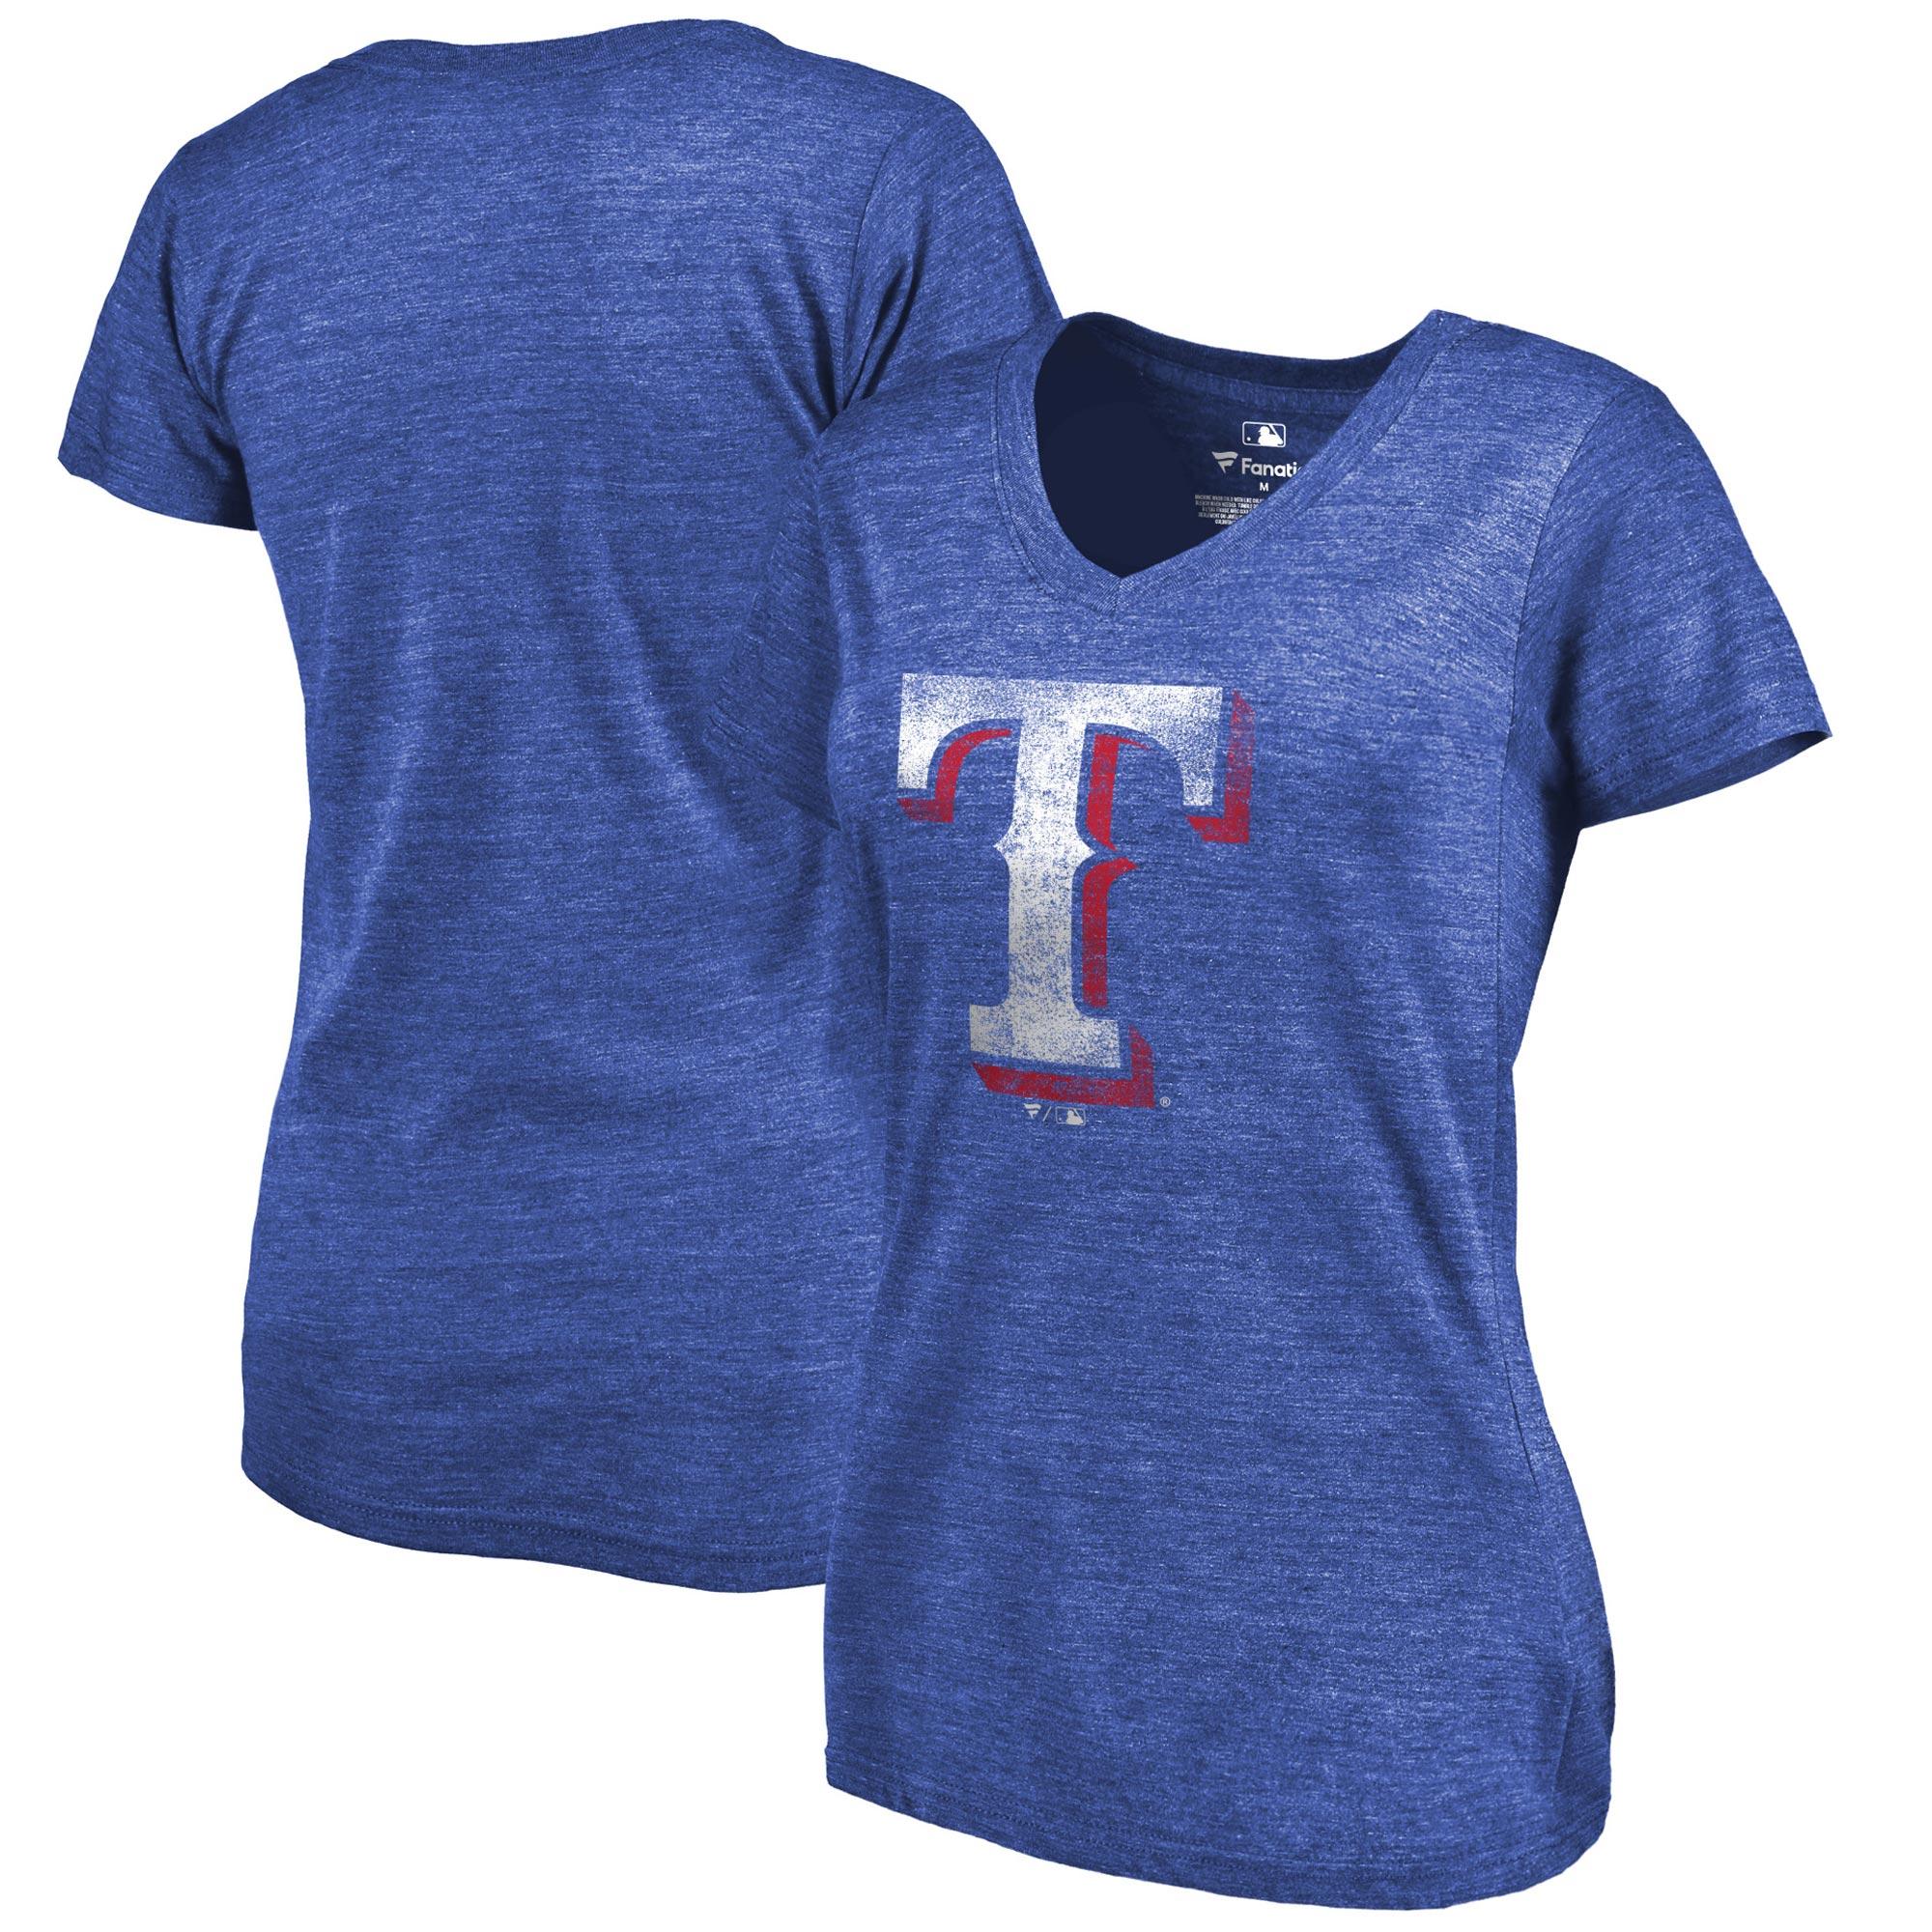 Texas Rangers Fanatics Branded Women's Primary Distressed Team Tri-Blend V-Neck T-Shirt - Heathered Royal